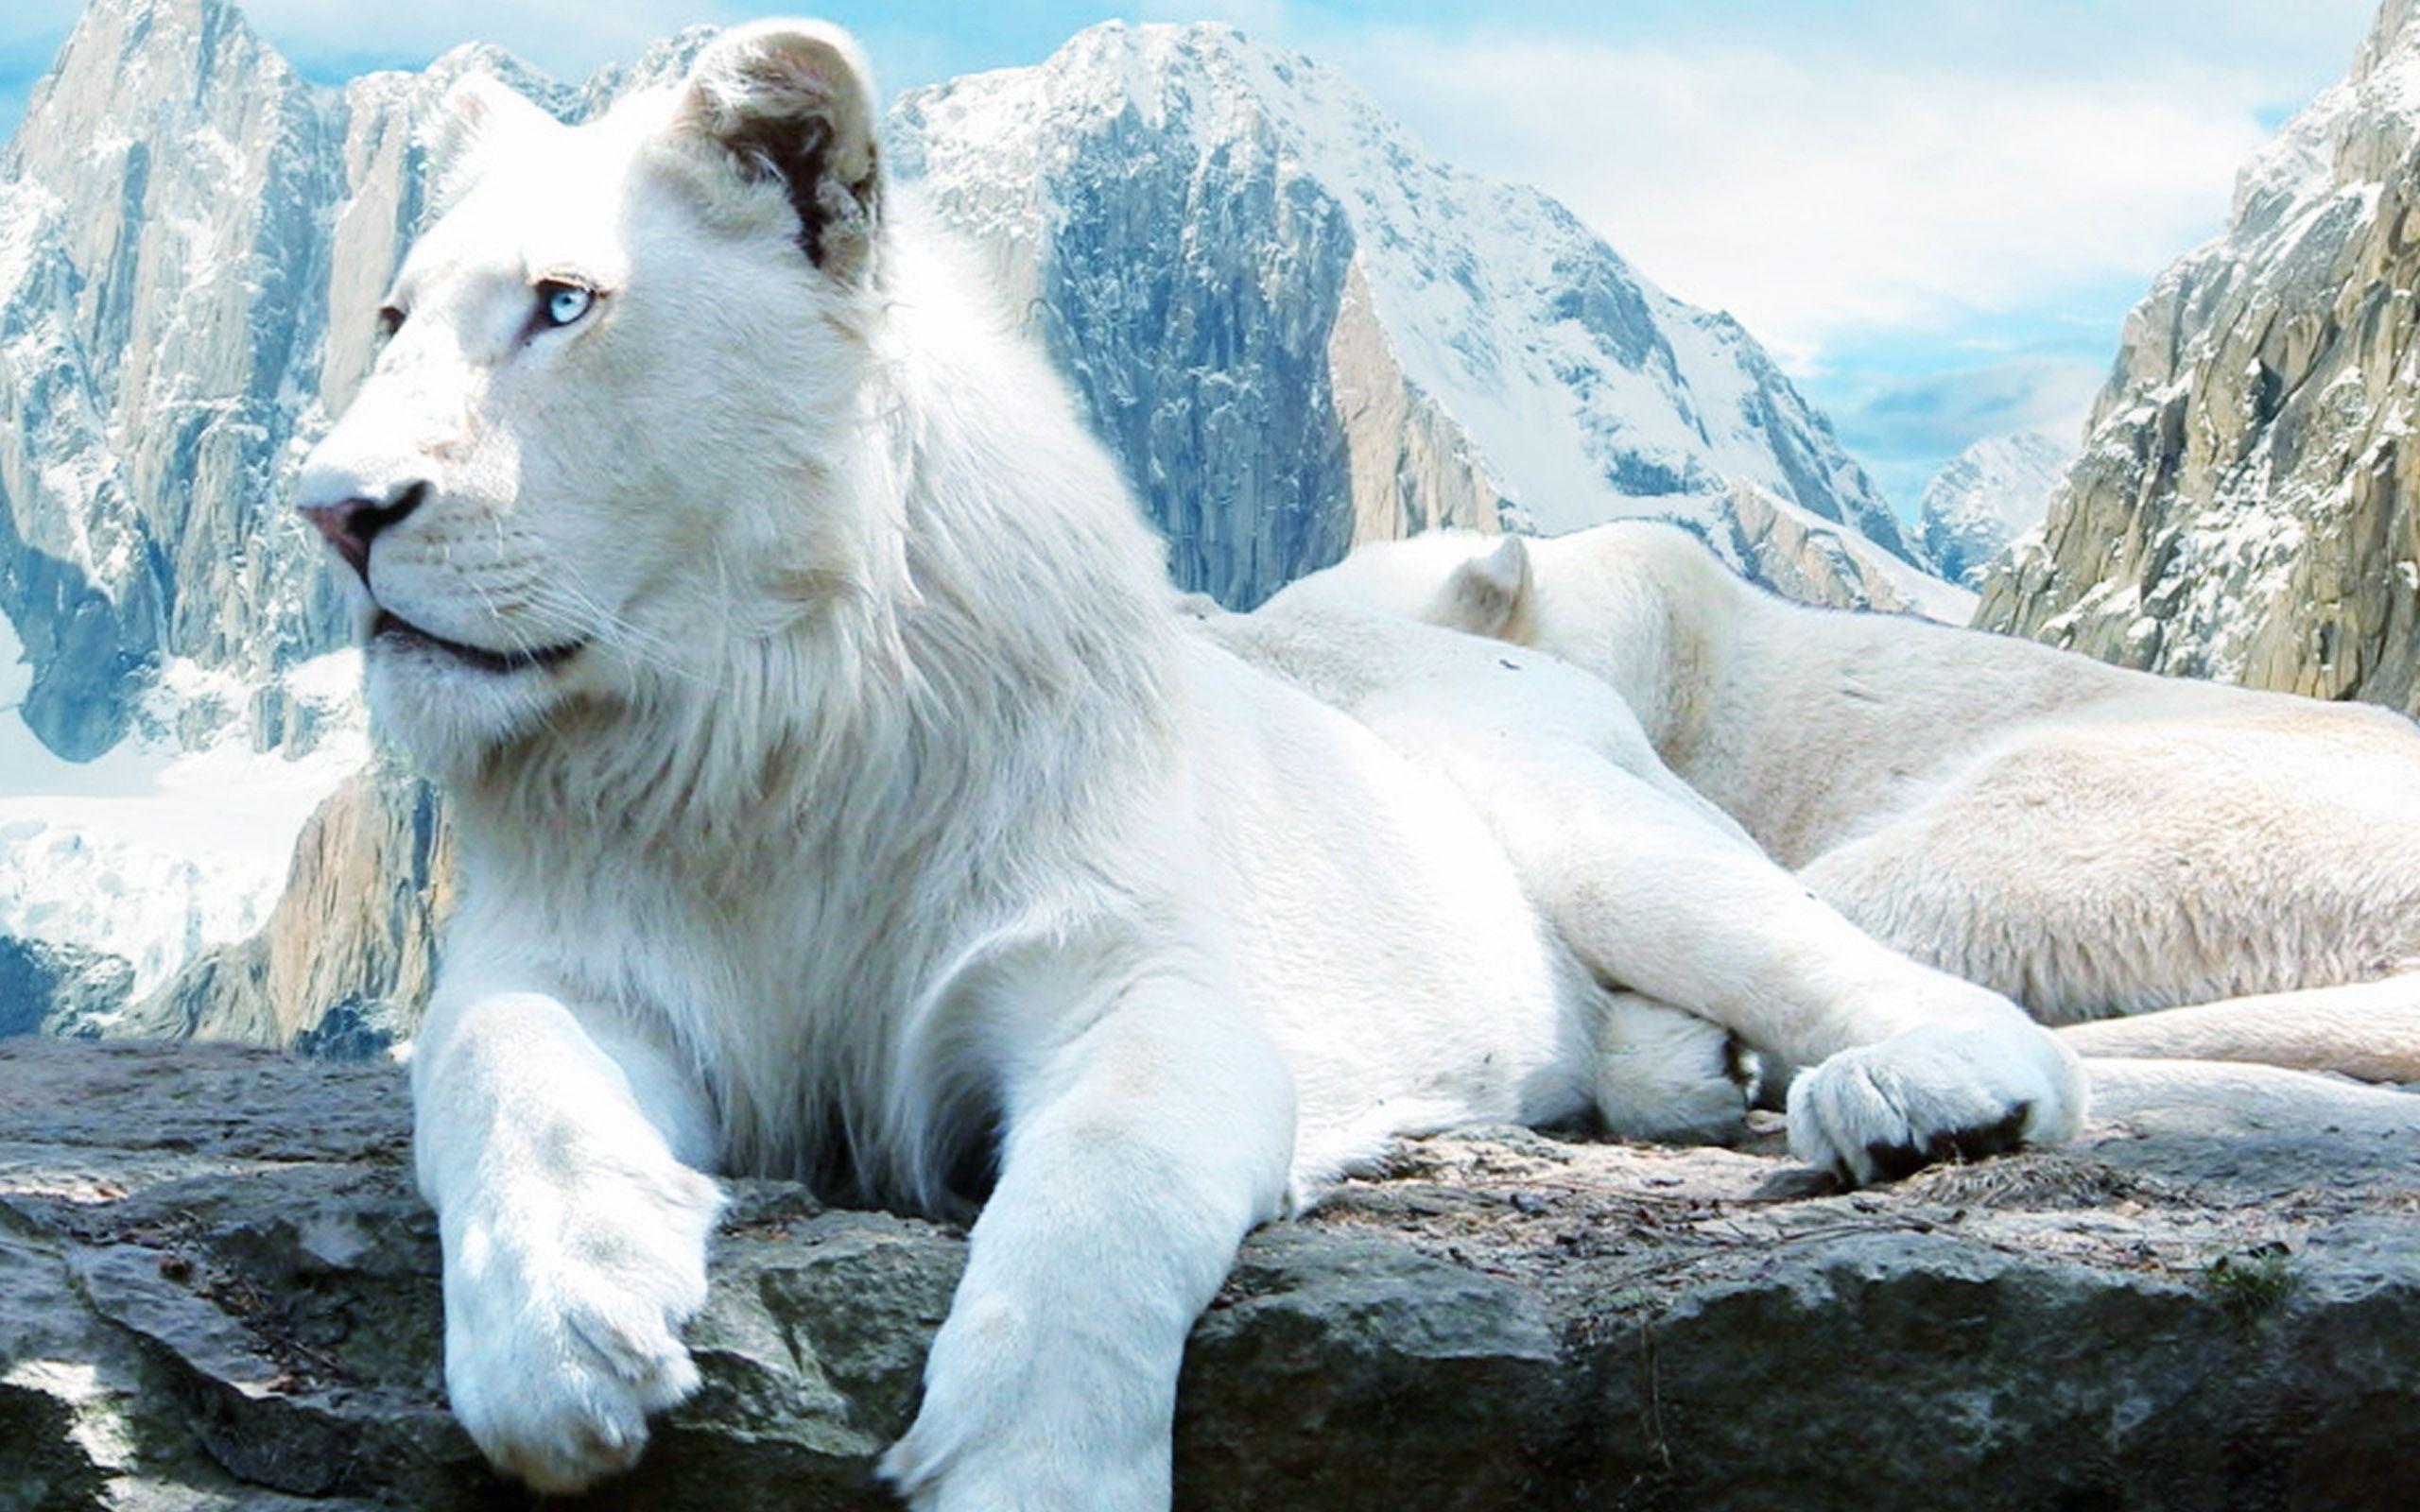 White Lion Wallpapers  Full HD wallpaper search